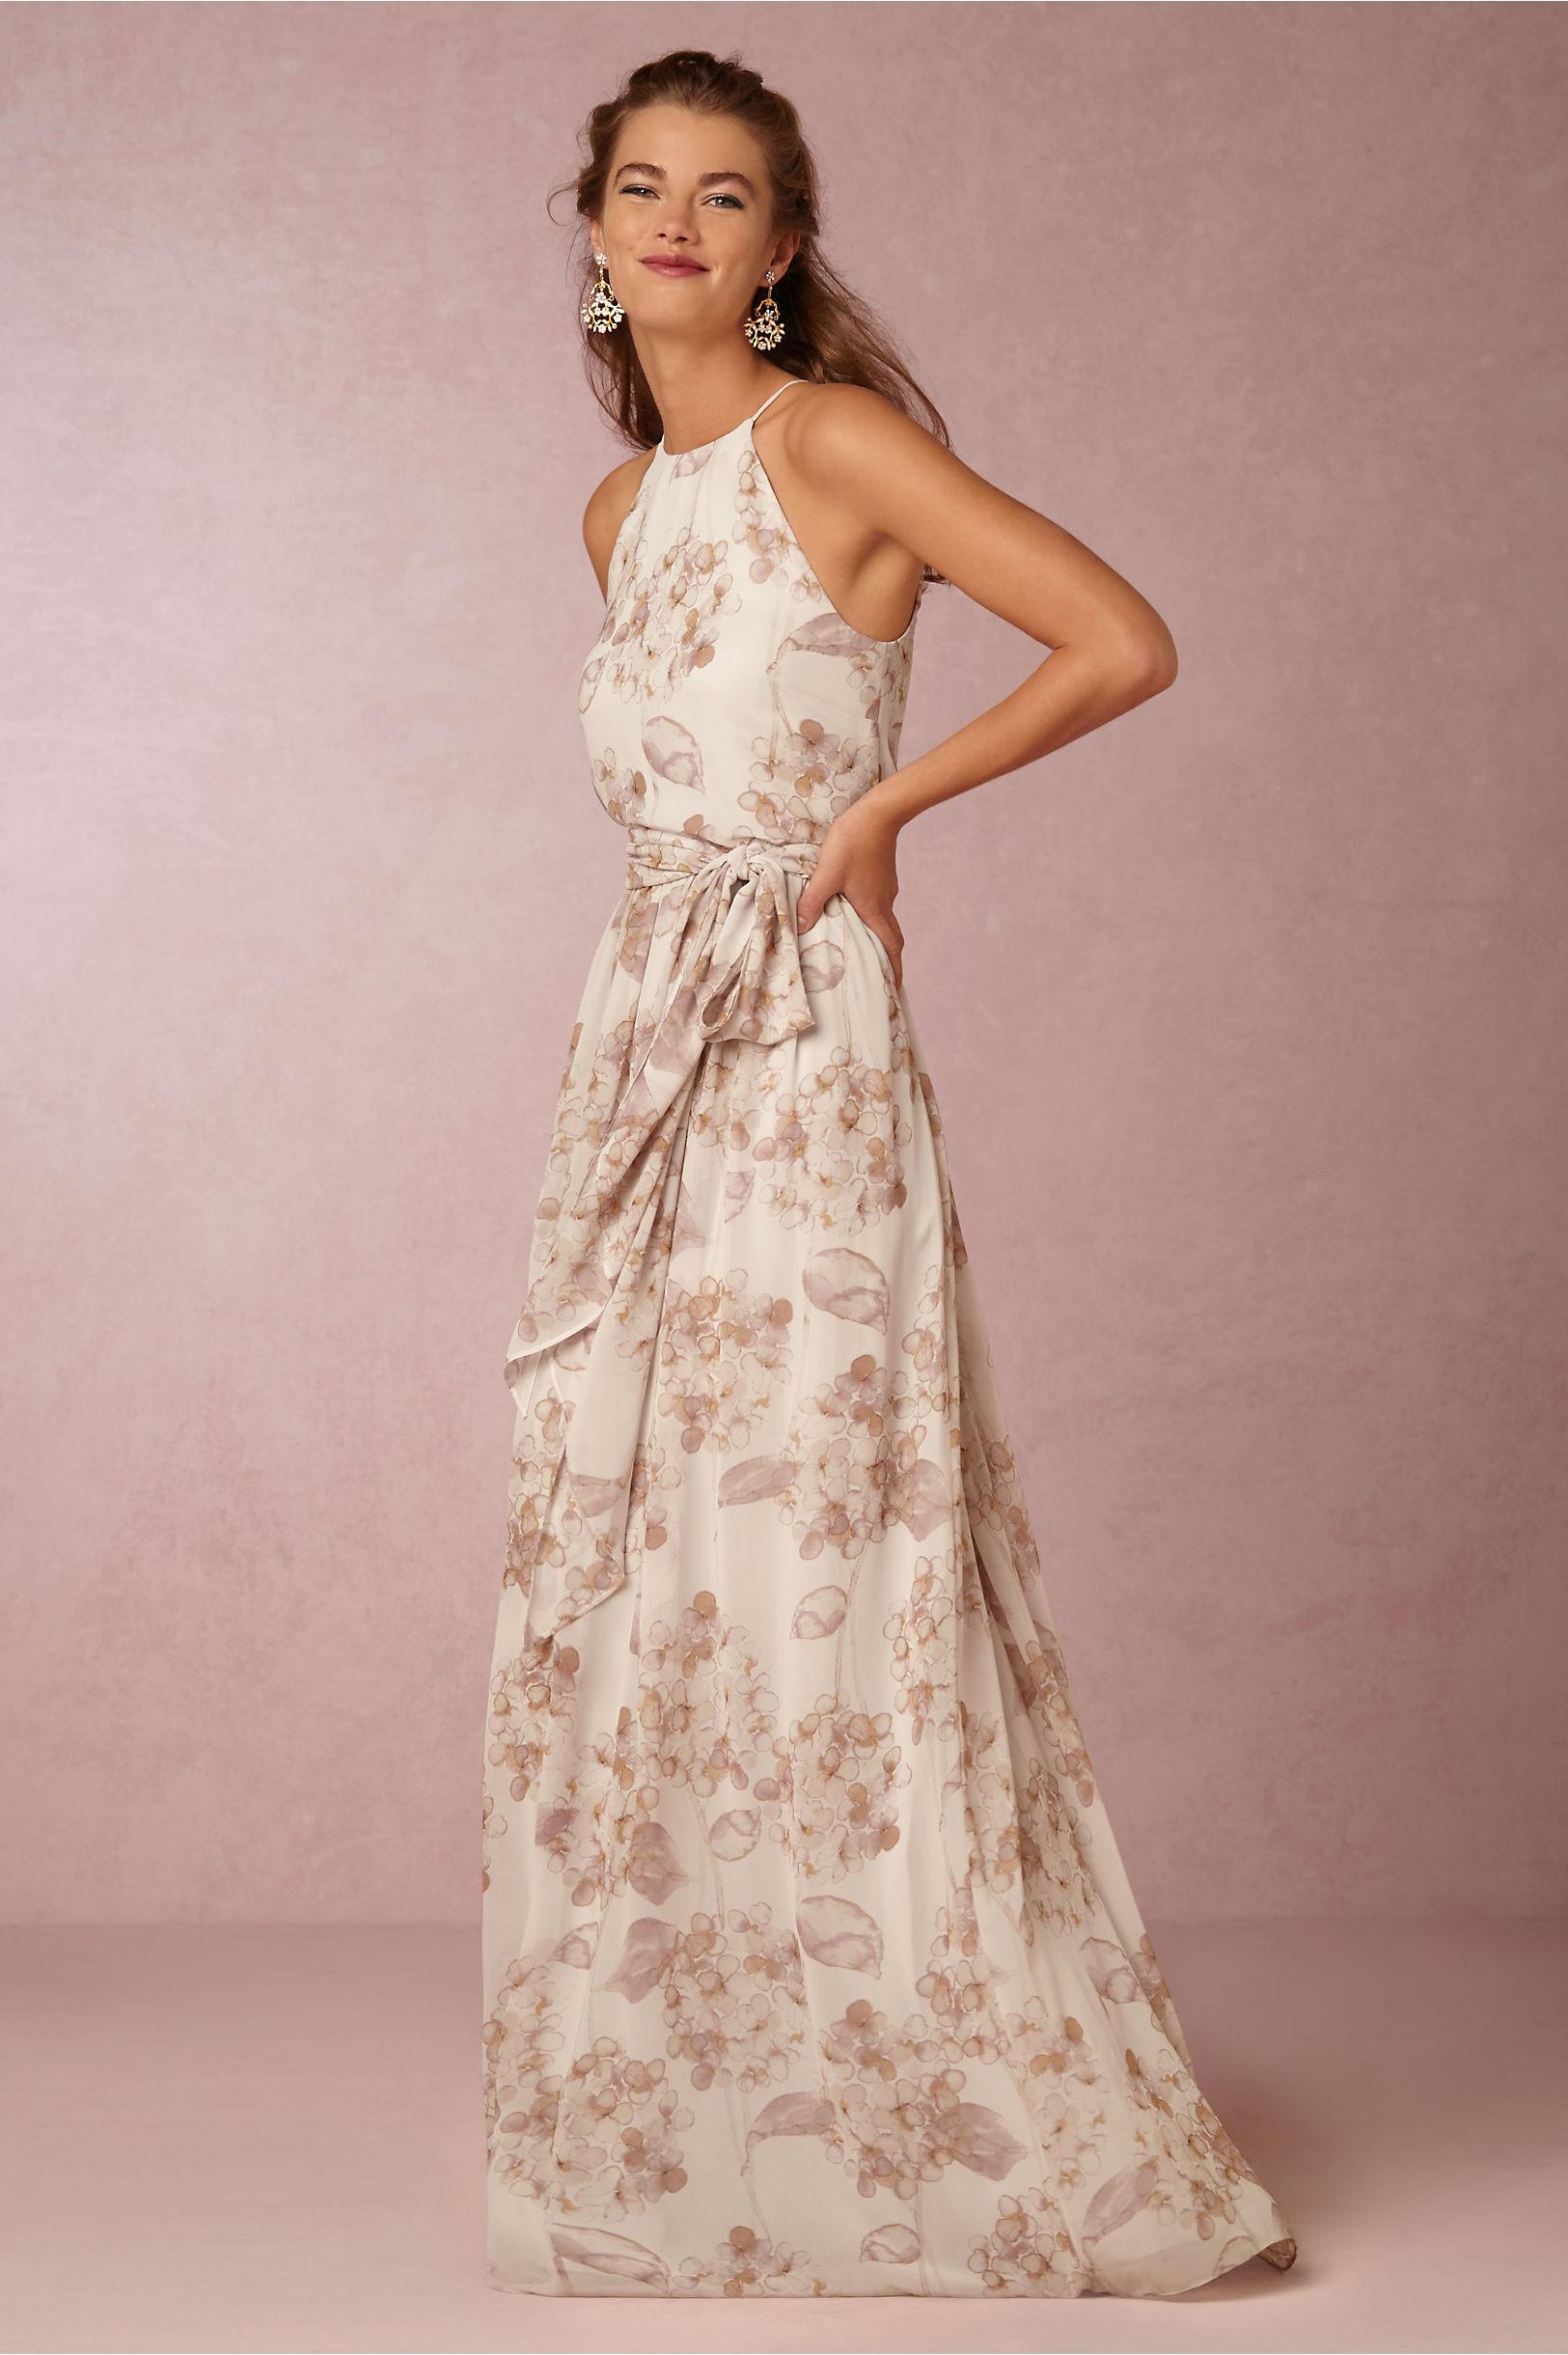 Awesome Wedding Dresses Altrincham Illustration - Wedding Dress ...